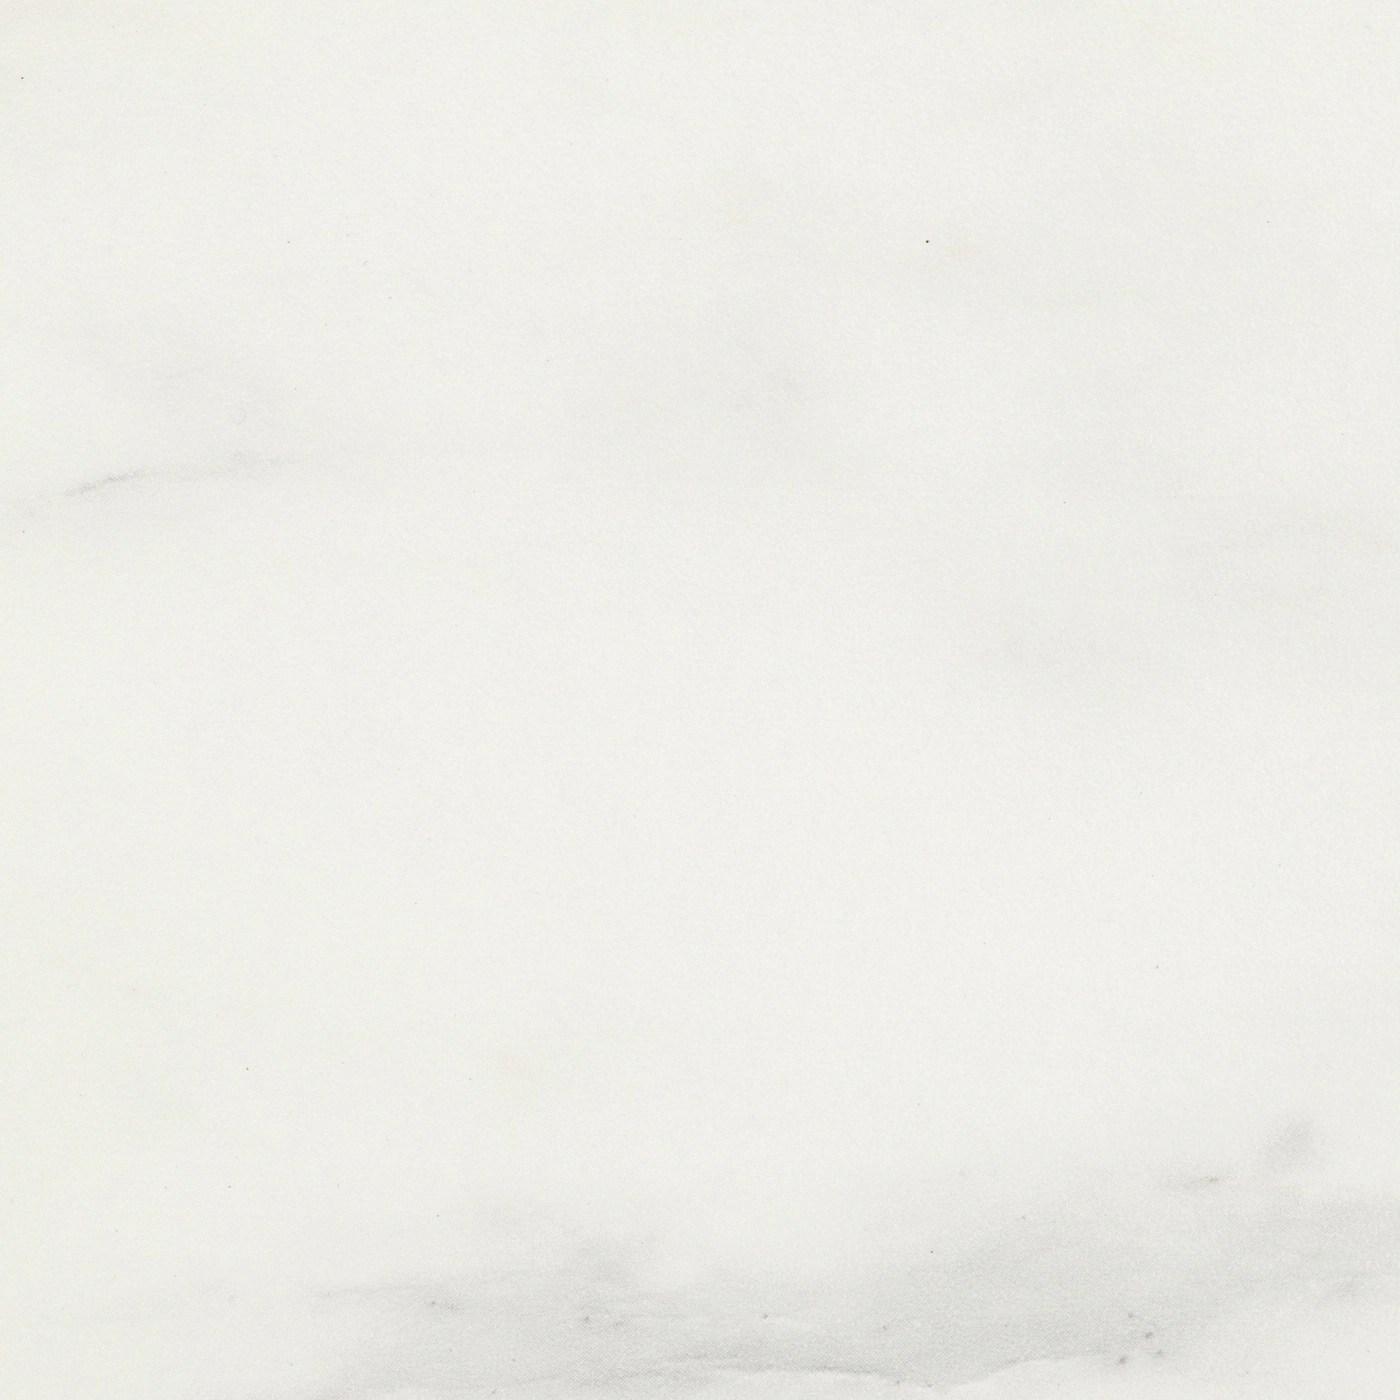 Ekbacken Plan De Travail Blanc Marbre Stratifie 246x2 8 Cm Ikea Suisse